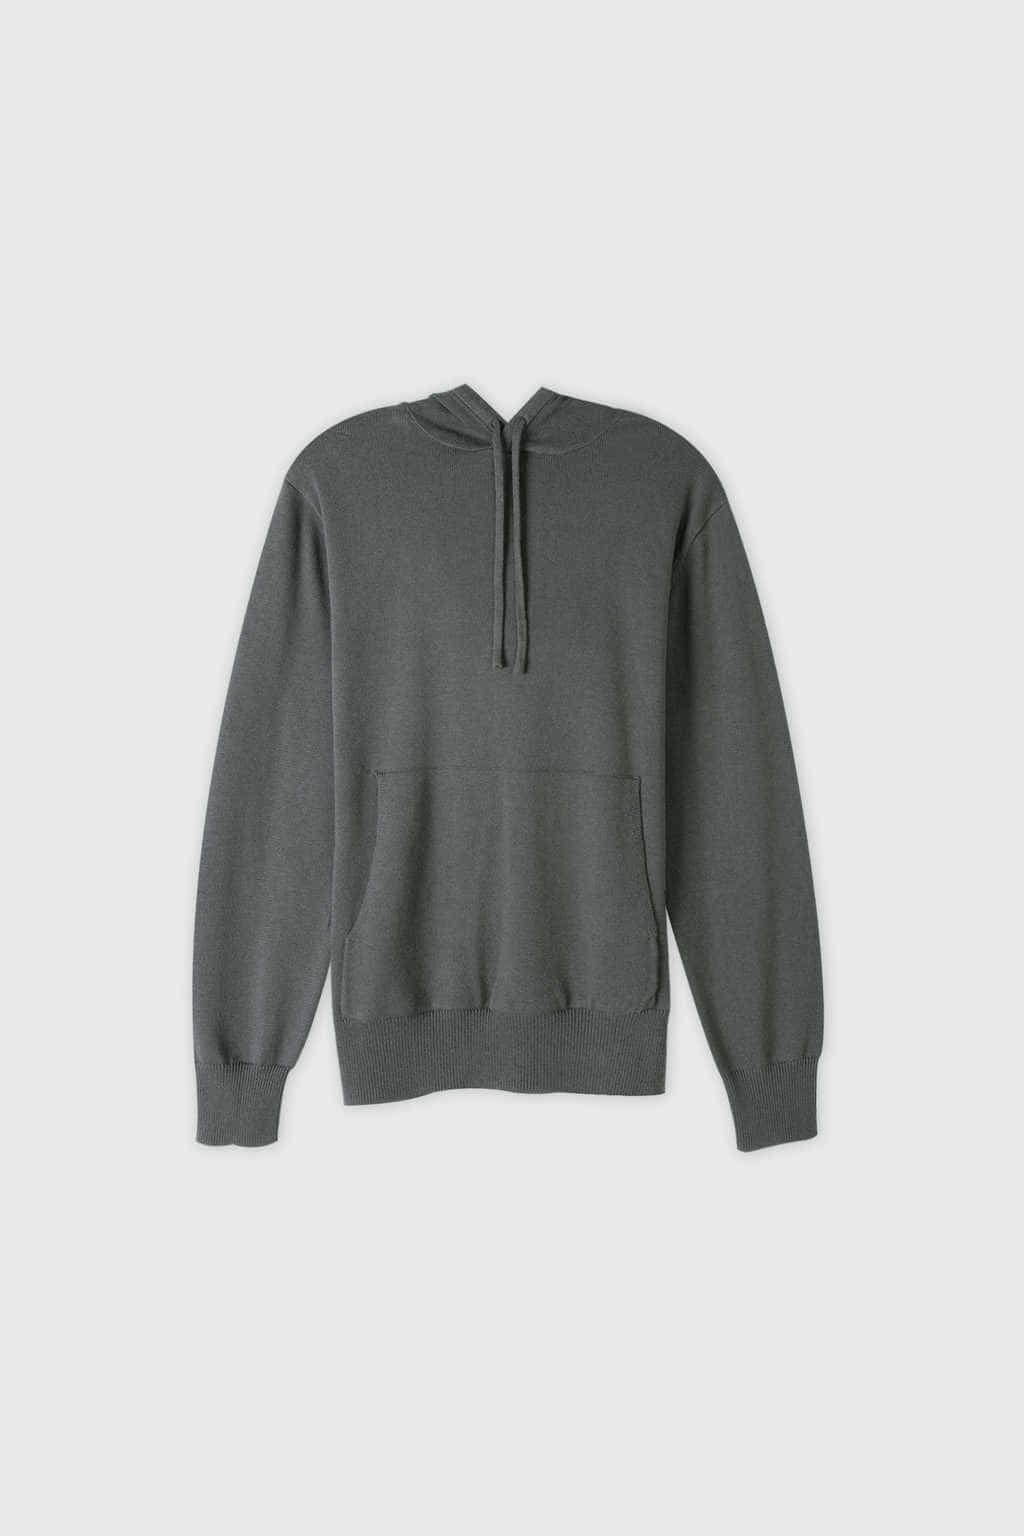 Sweater 2756 Olive 5